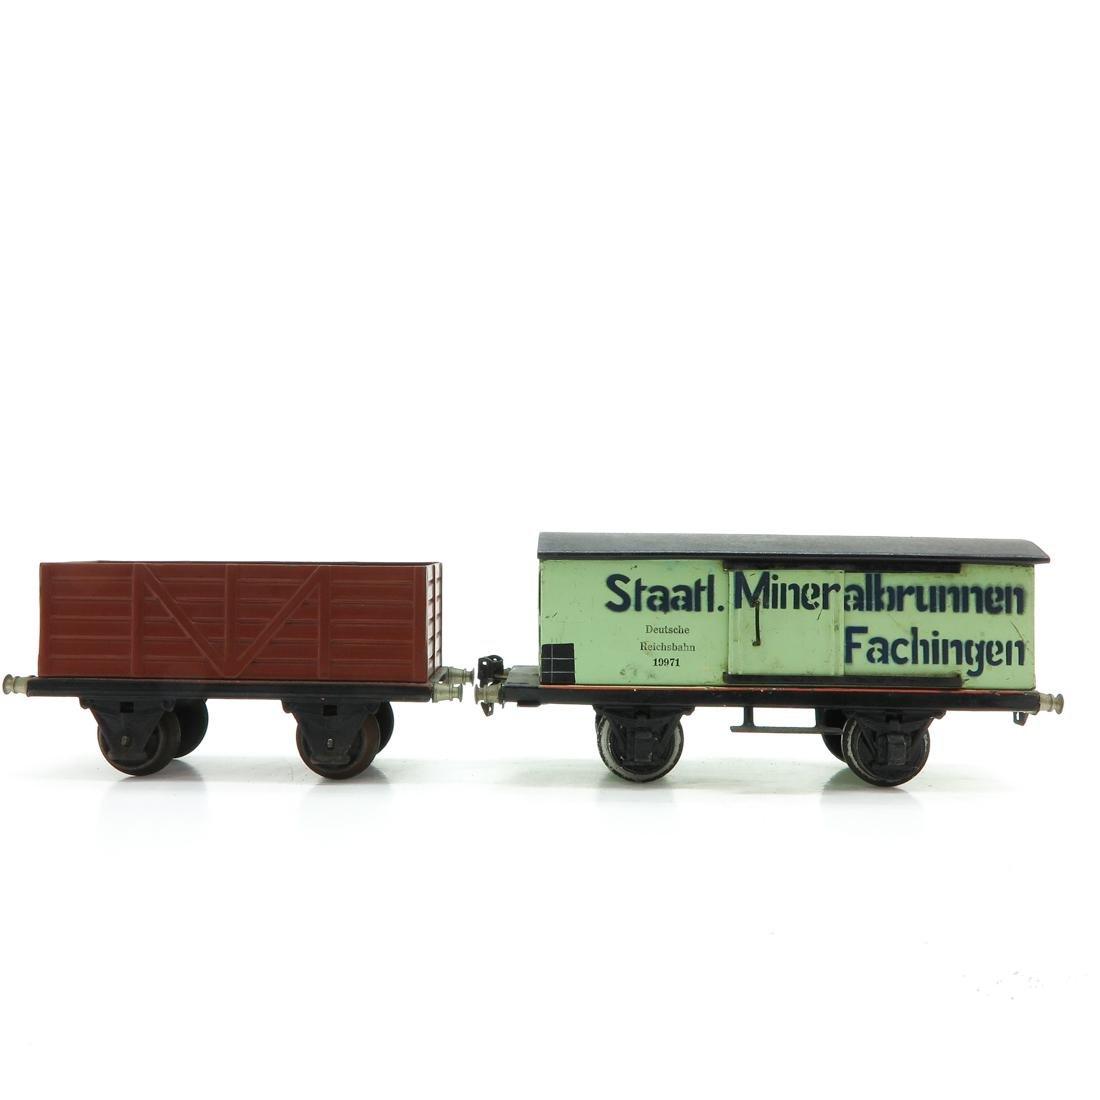 Lot of 2 Vintage Marklin Wagons